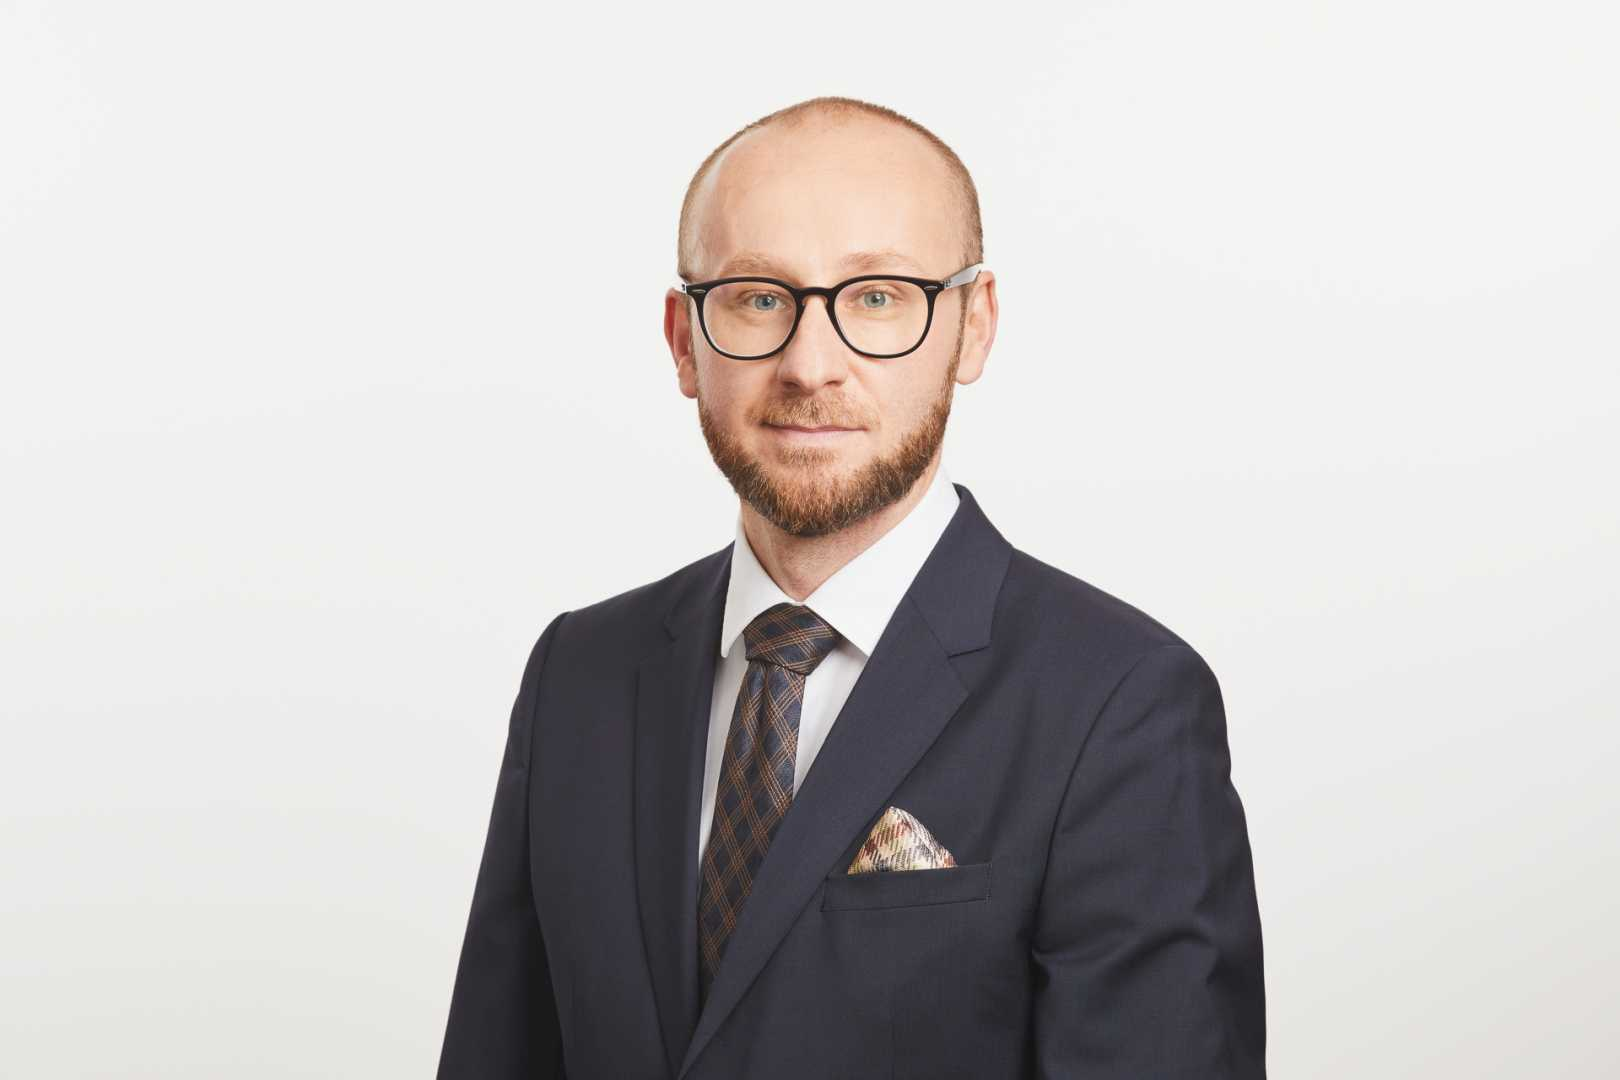 Michał<br>Łomżyński